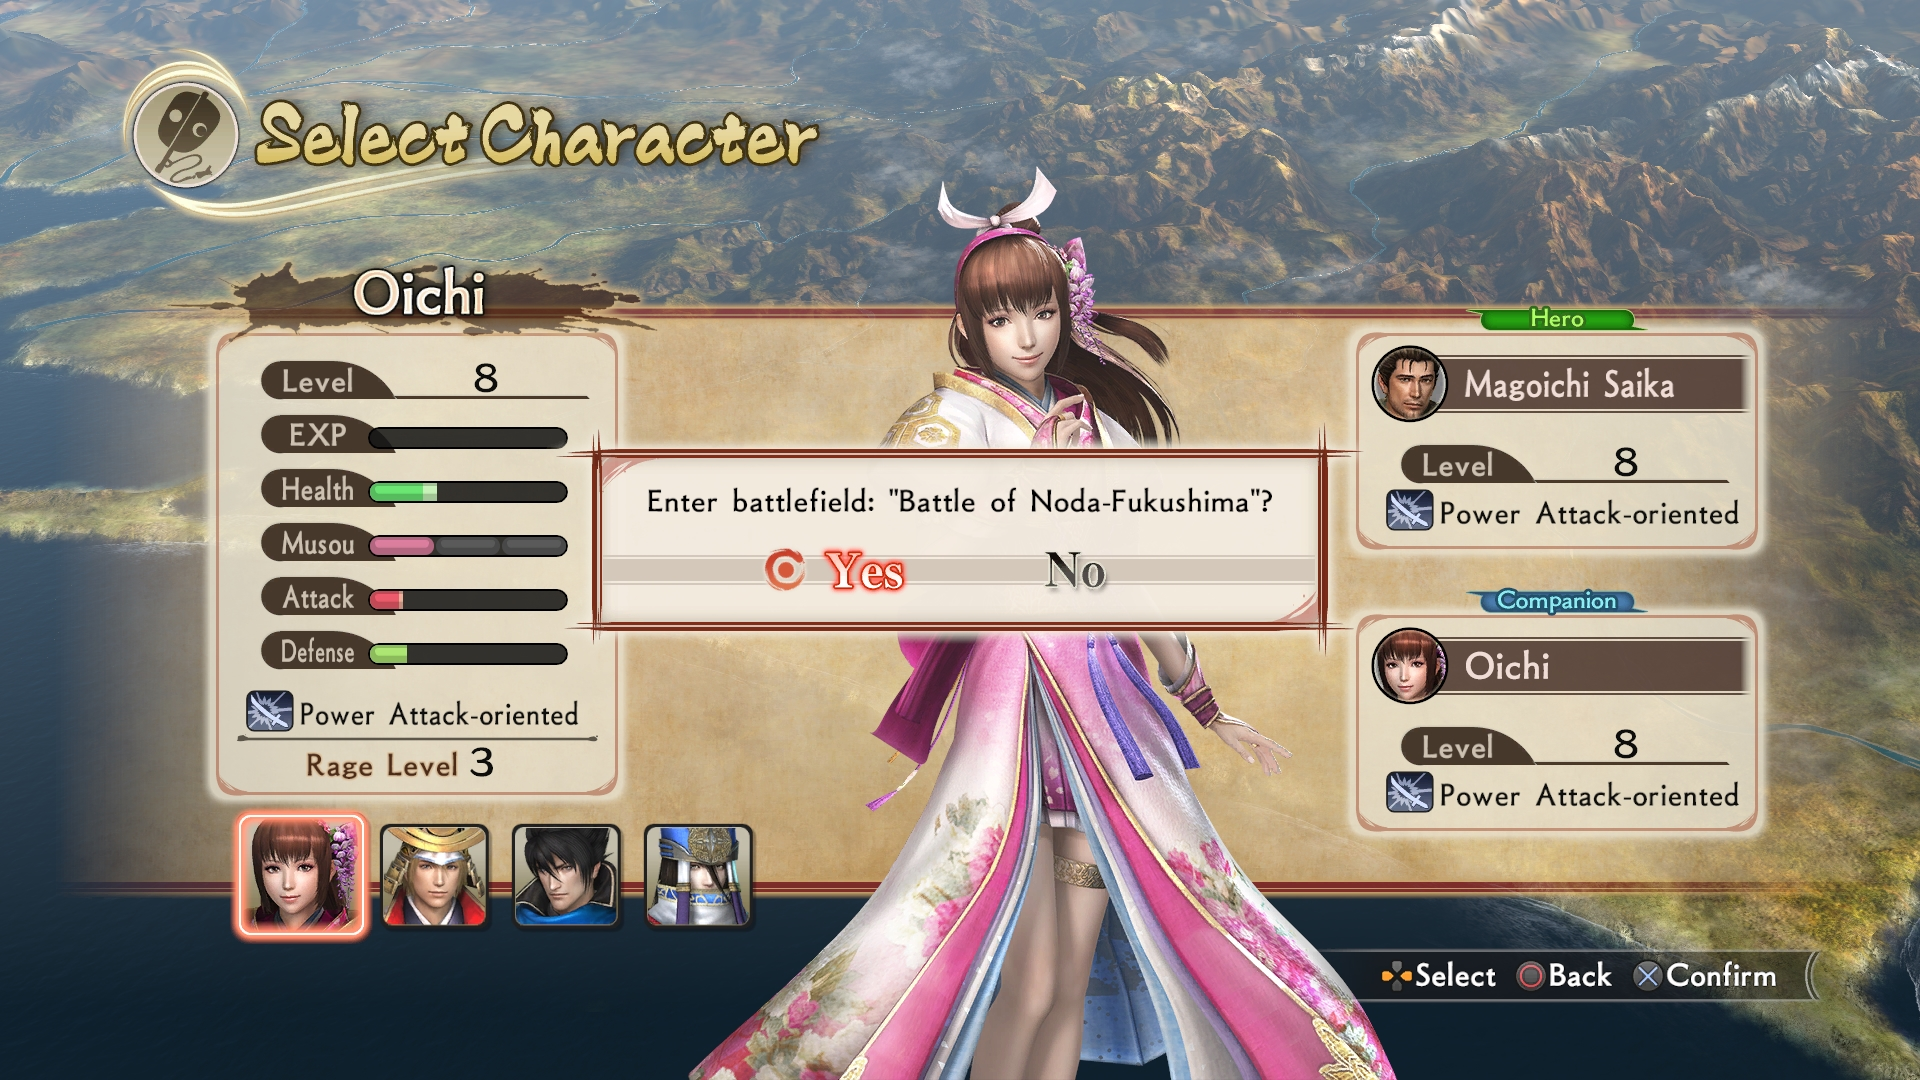 Detaily bojového systému v Samurai Warriors: Spirit of Sanada 142492